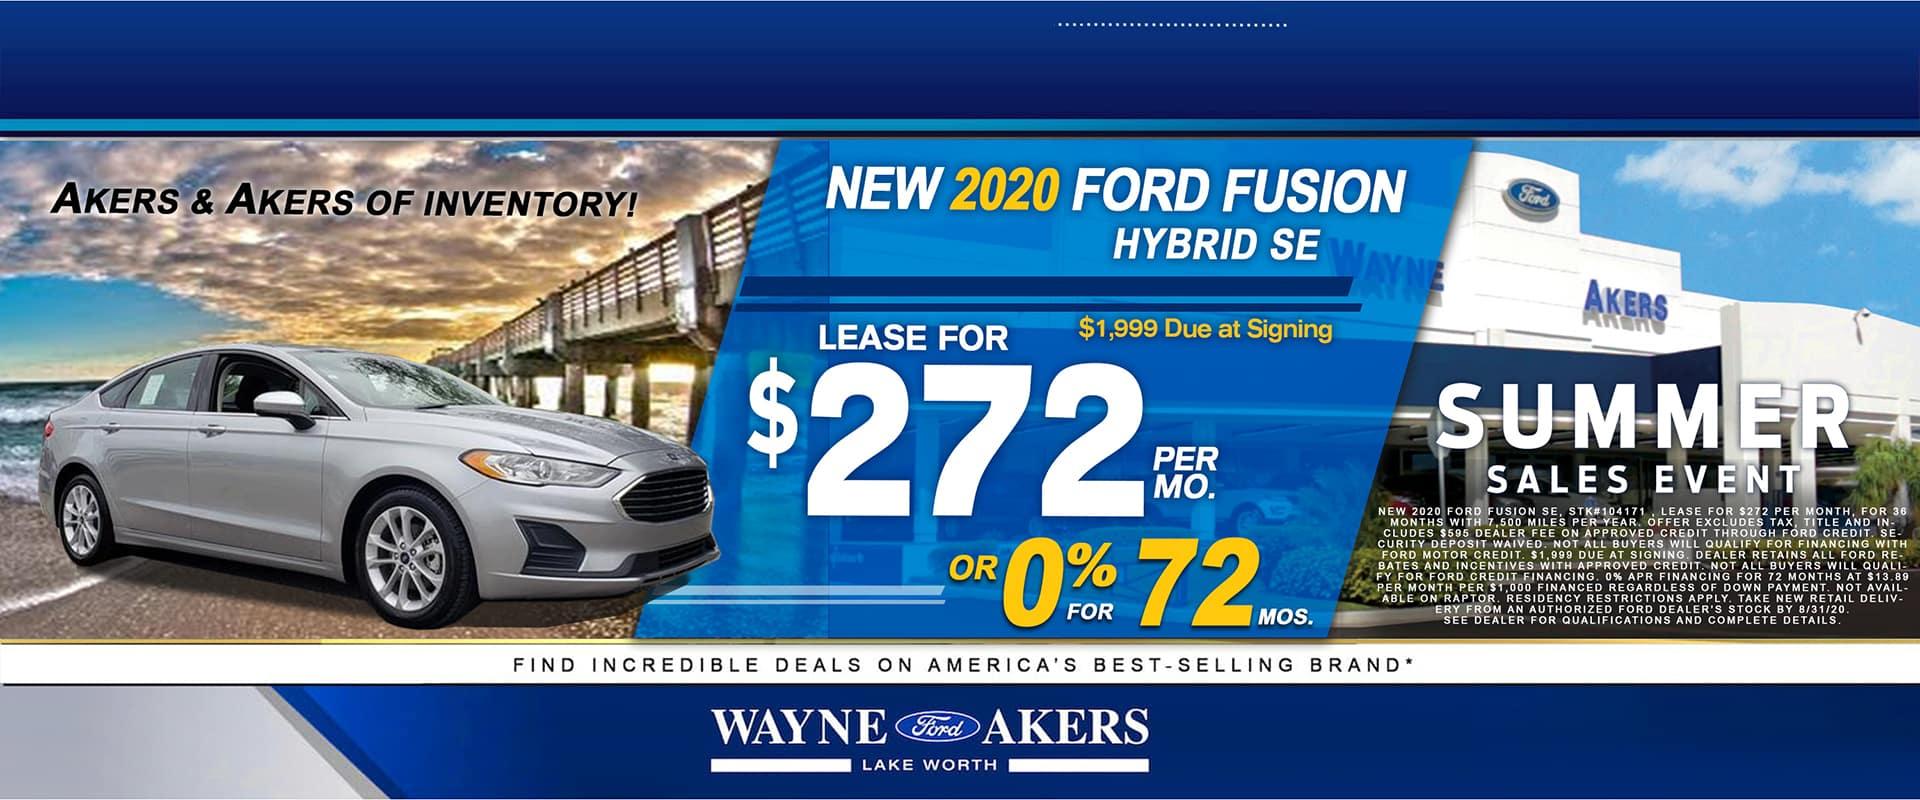 2020 Nissan Fusion Banner